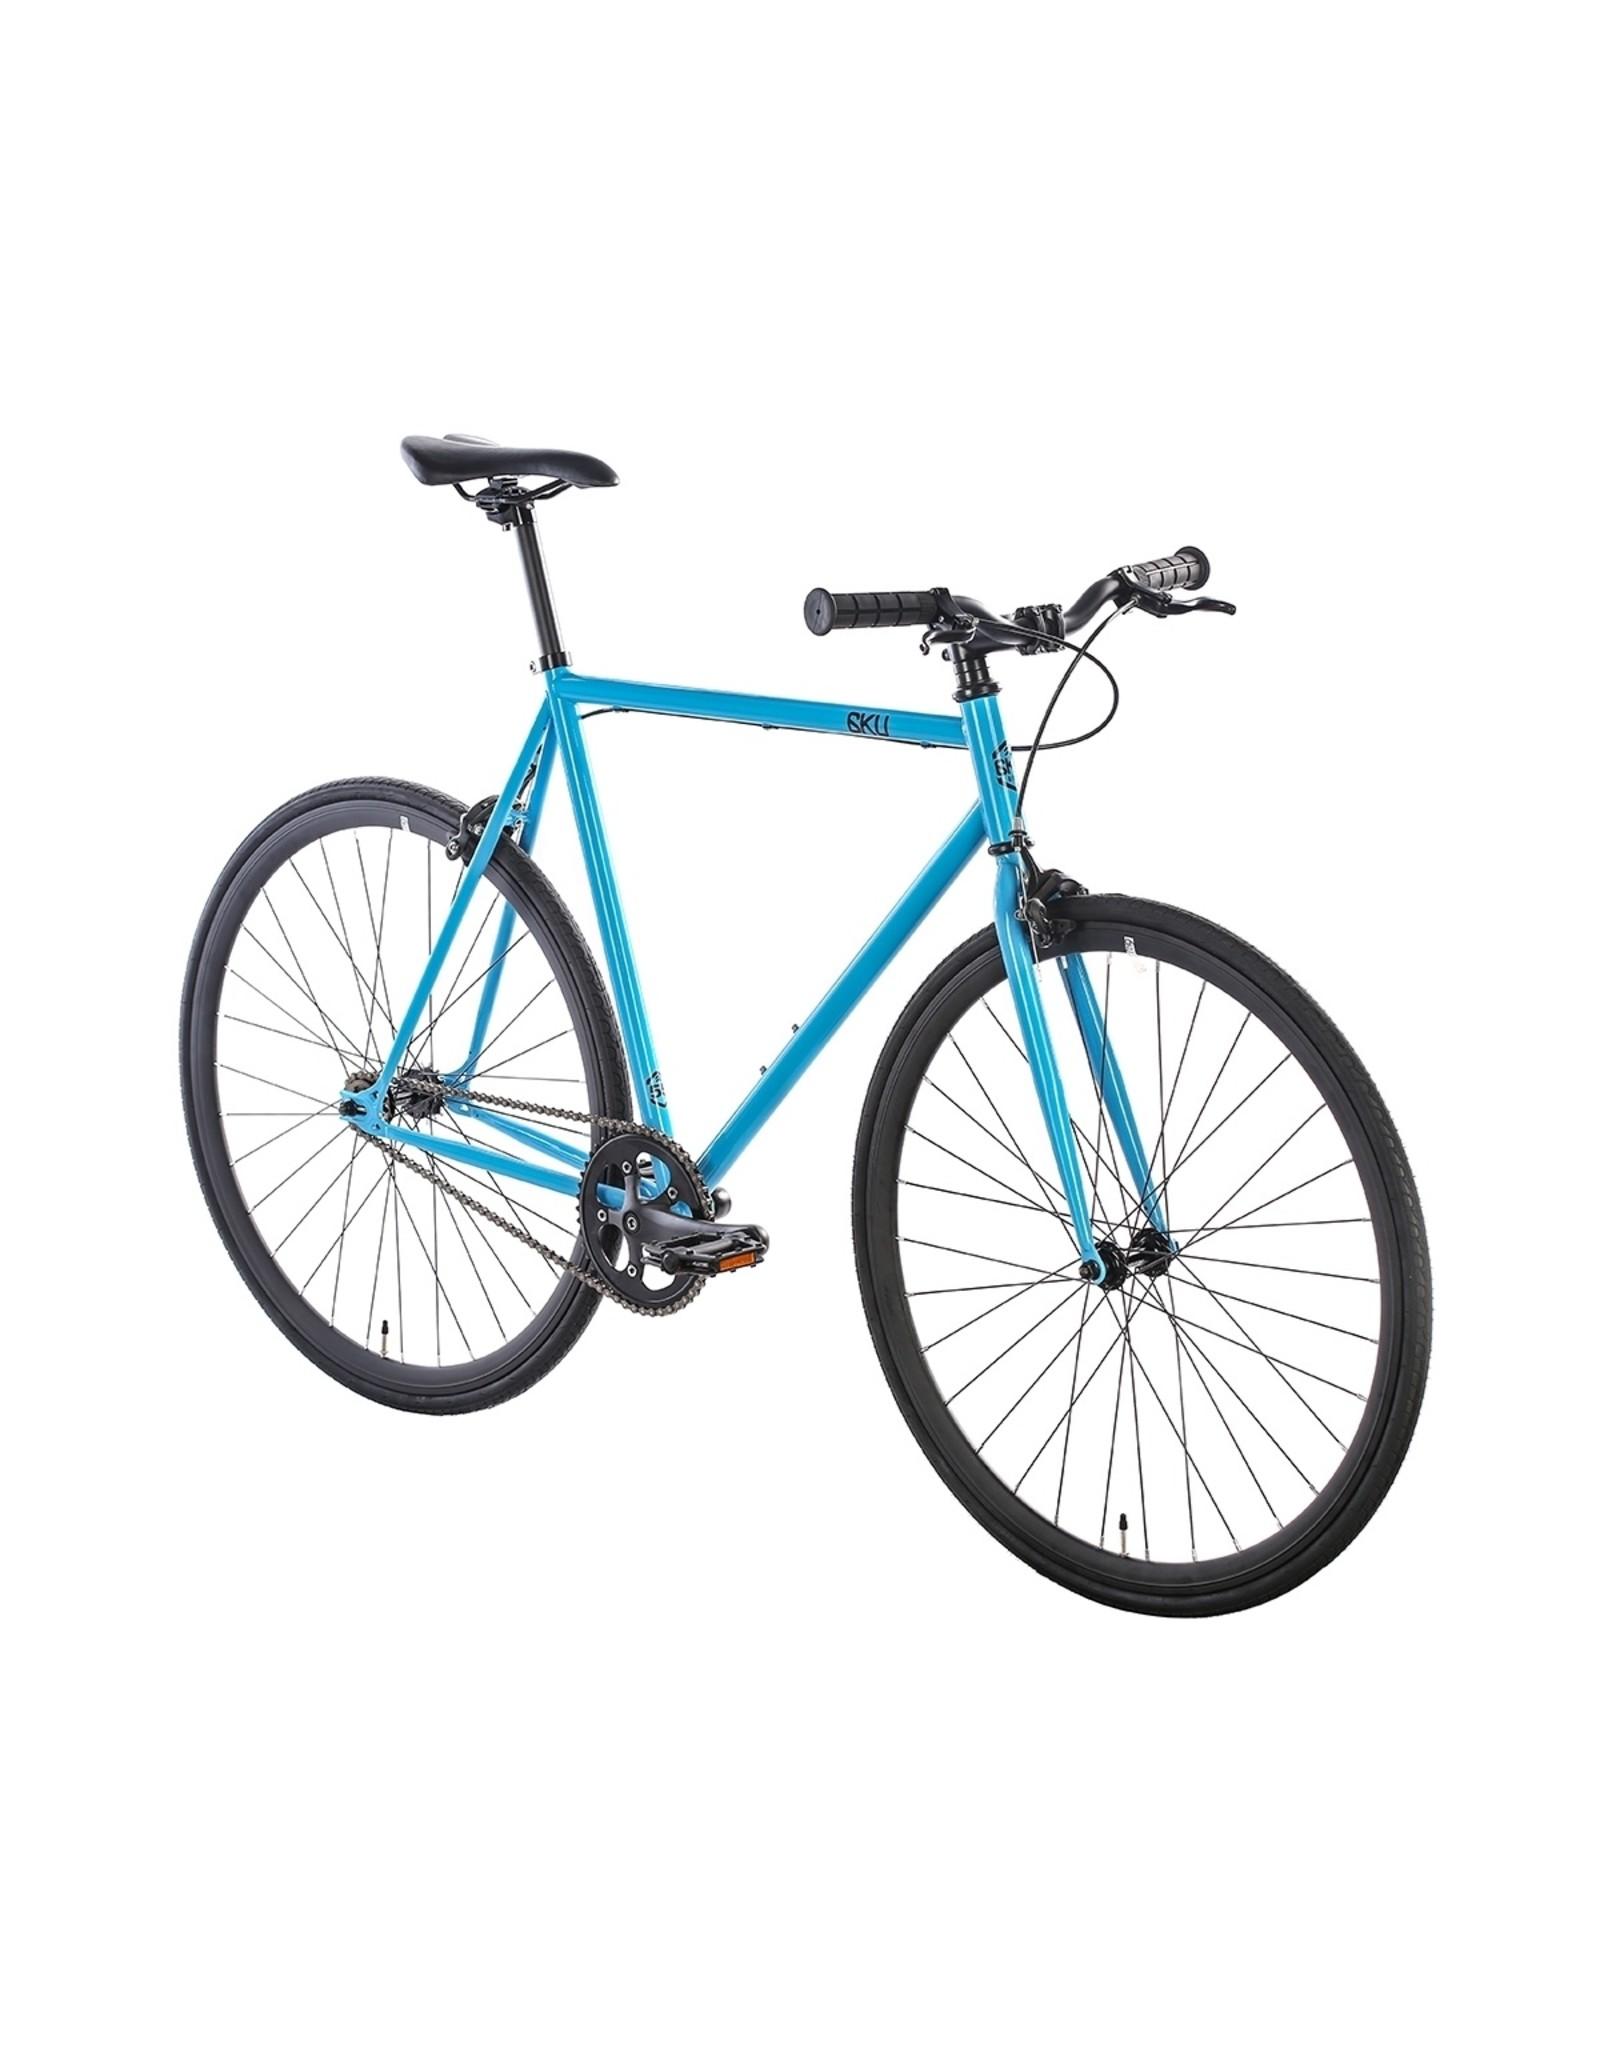 2018 6KU Fixie & Single Speed Bike - IrisSize:49cm blue / black wheels